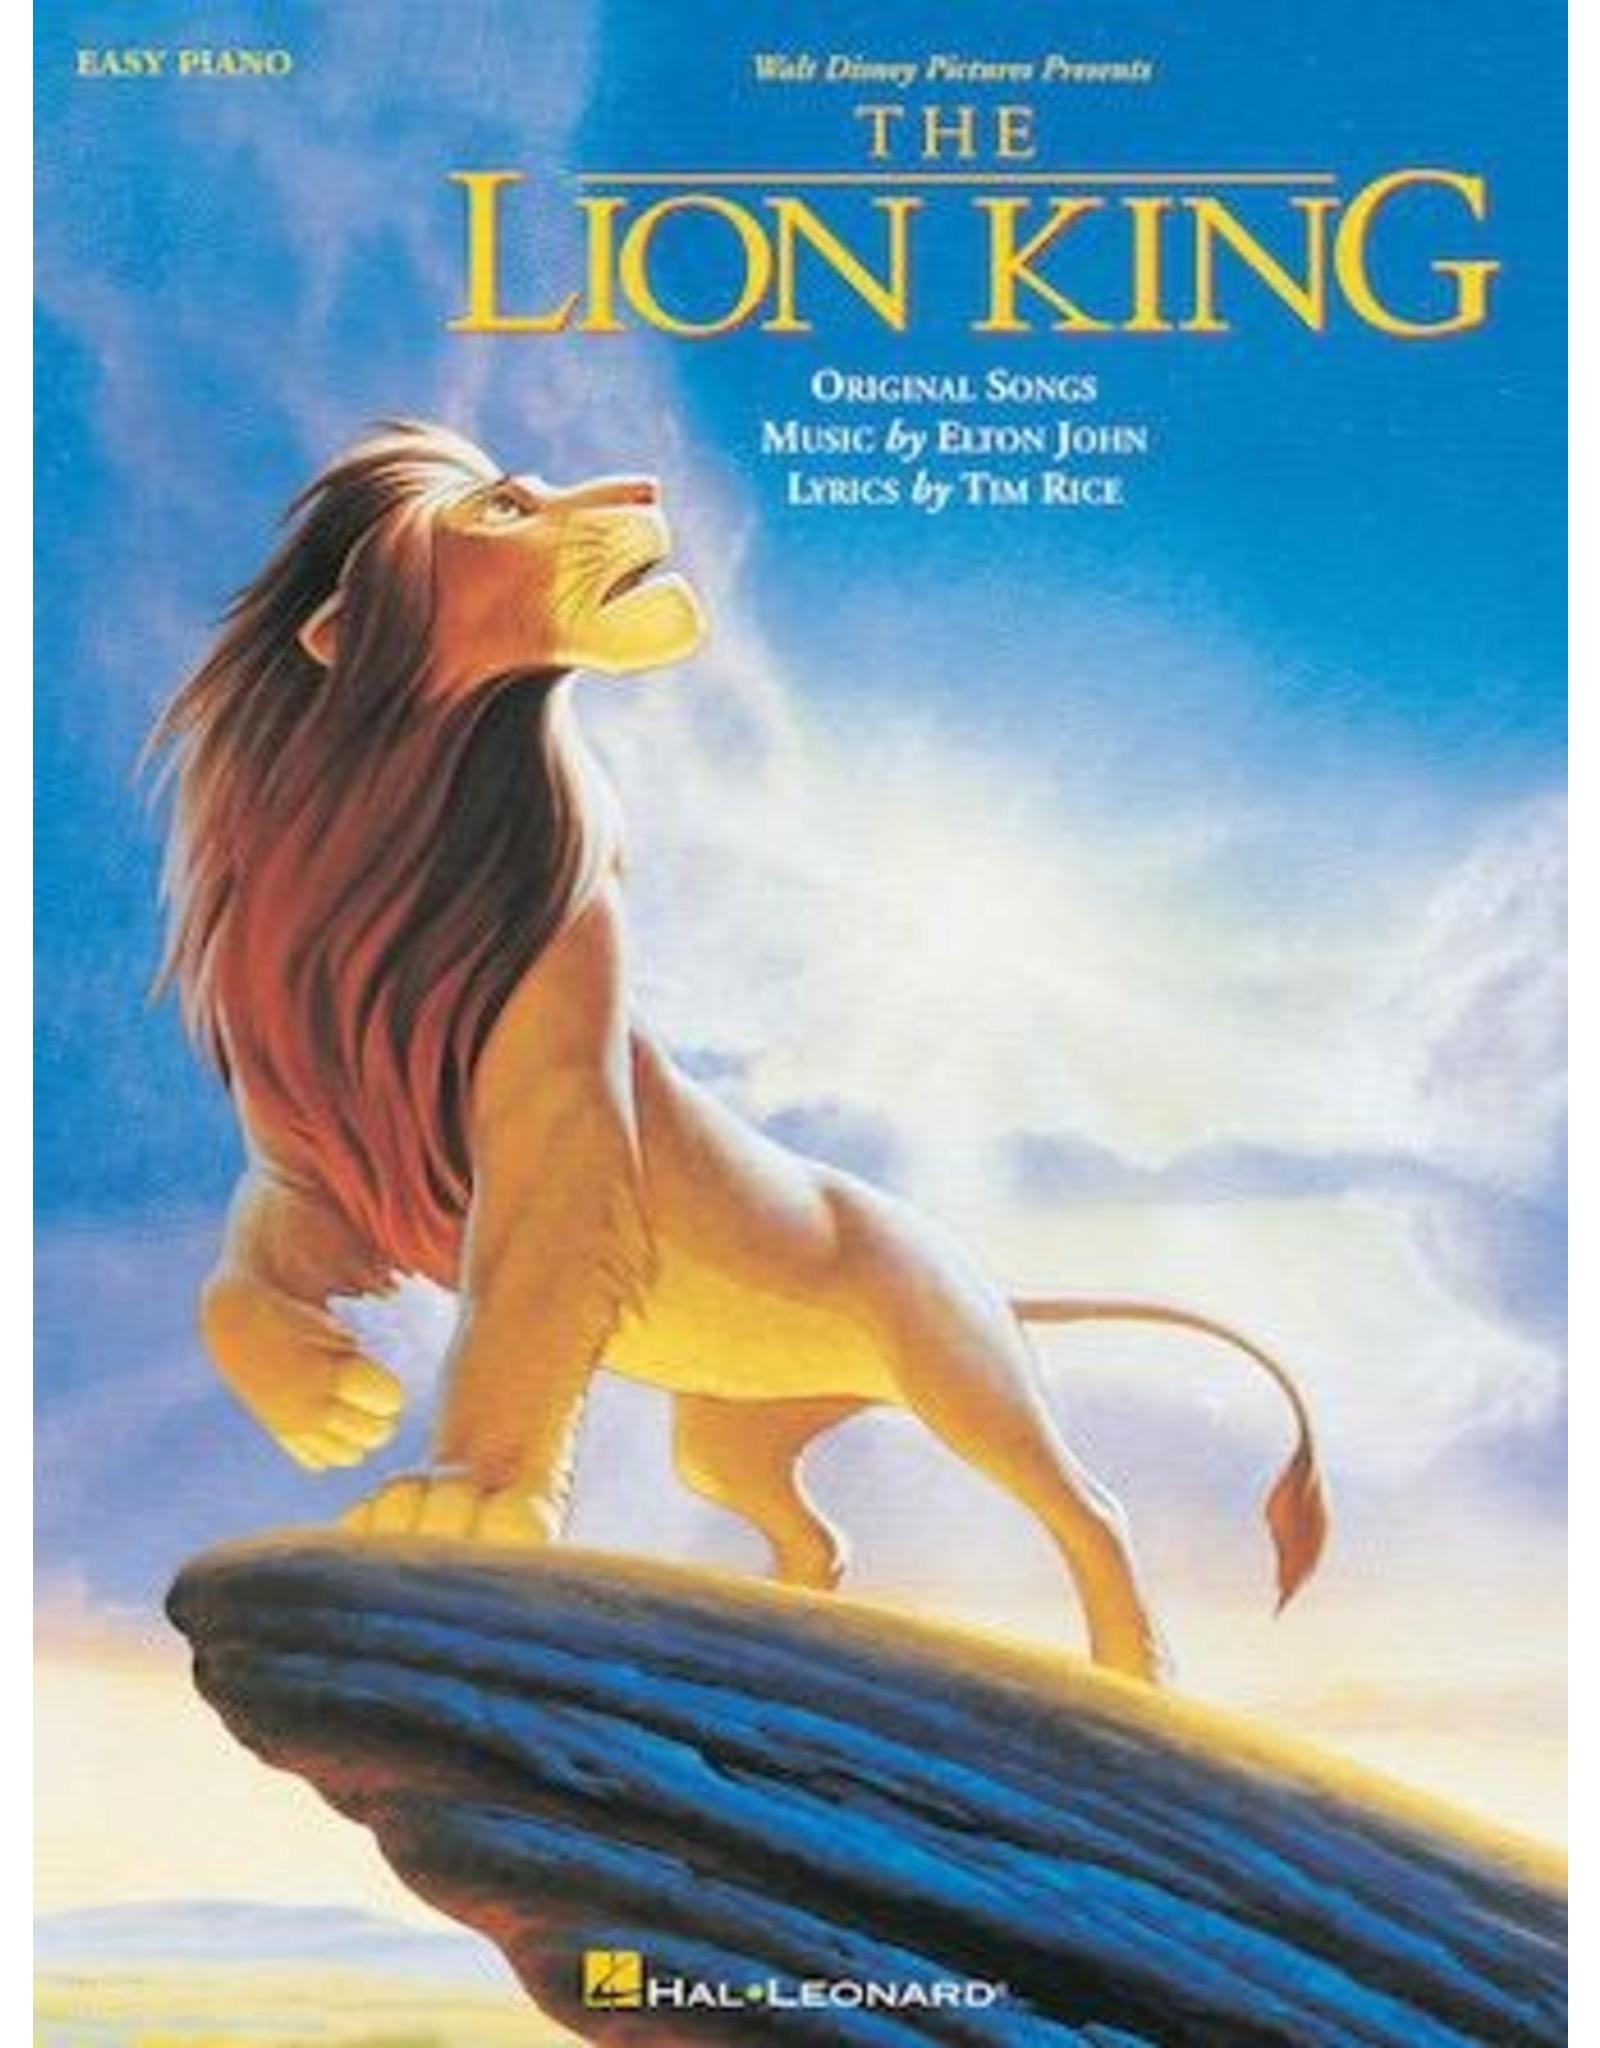 Hal Leonard Lion King Easy Piano (Animated Movie)